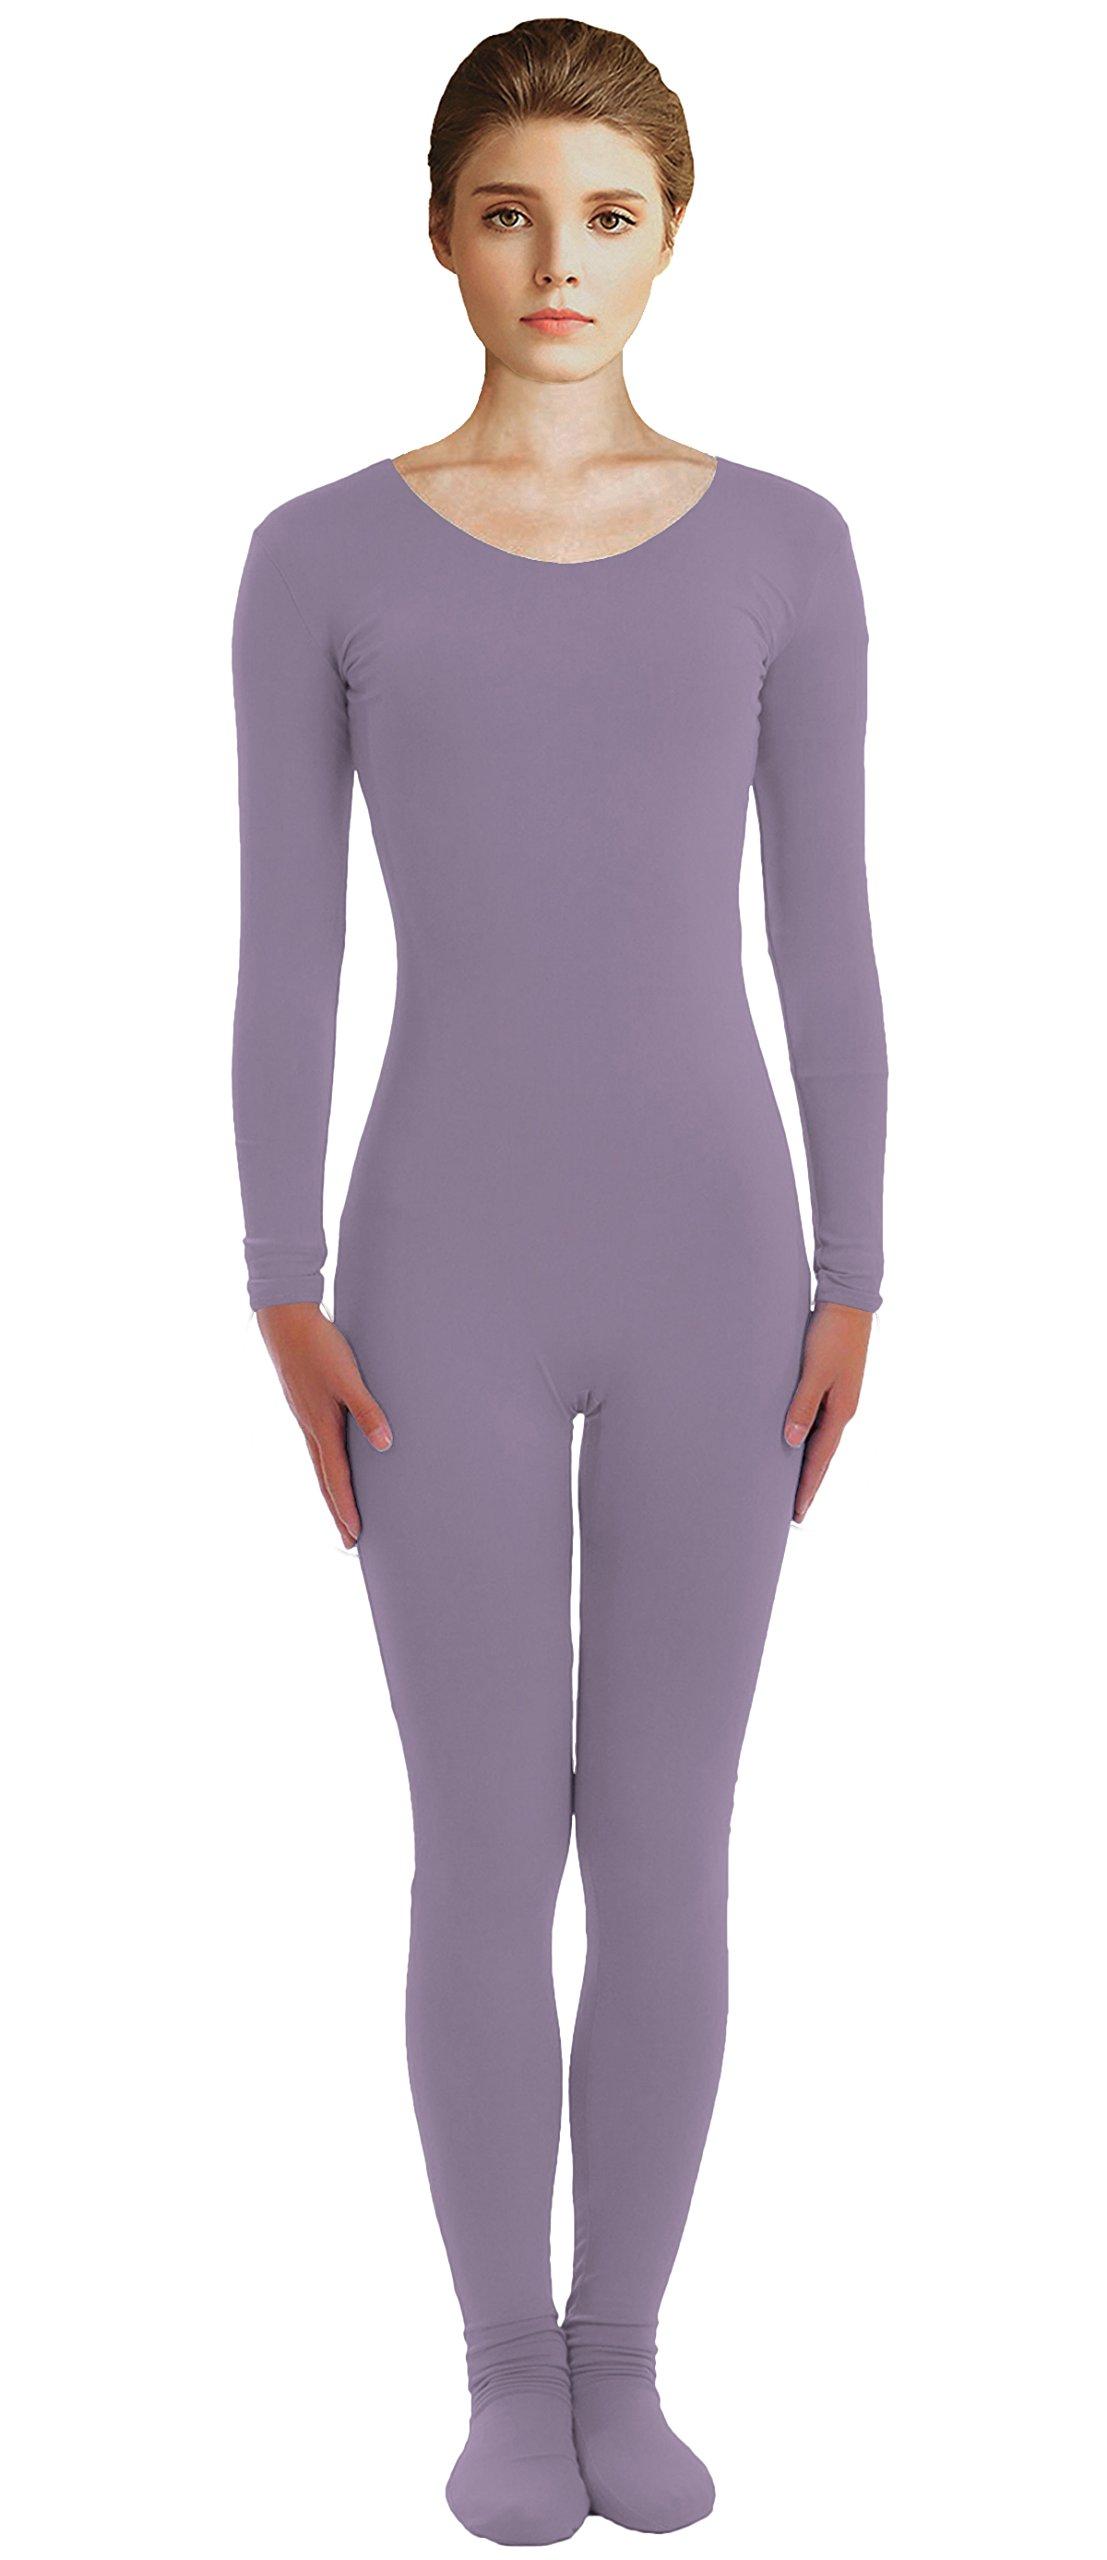 VSVO Adult Dark Grey Scoop Neckline Unitard with Socks Catsuit Dancewear (XX-Large, Dark Grey) by VSVO